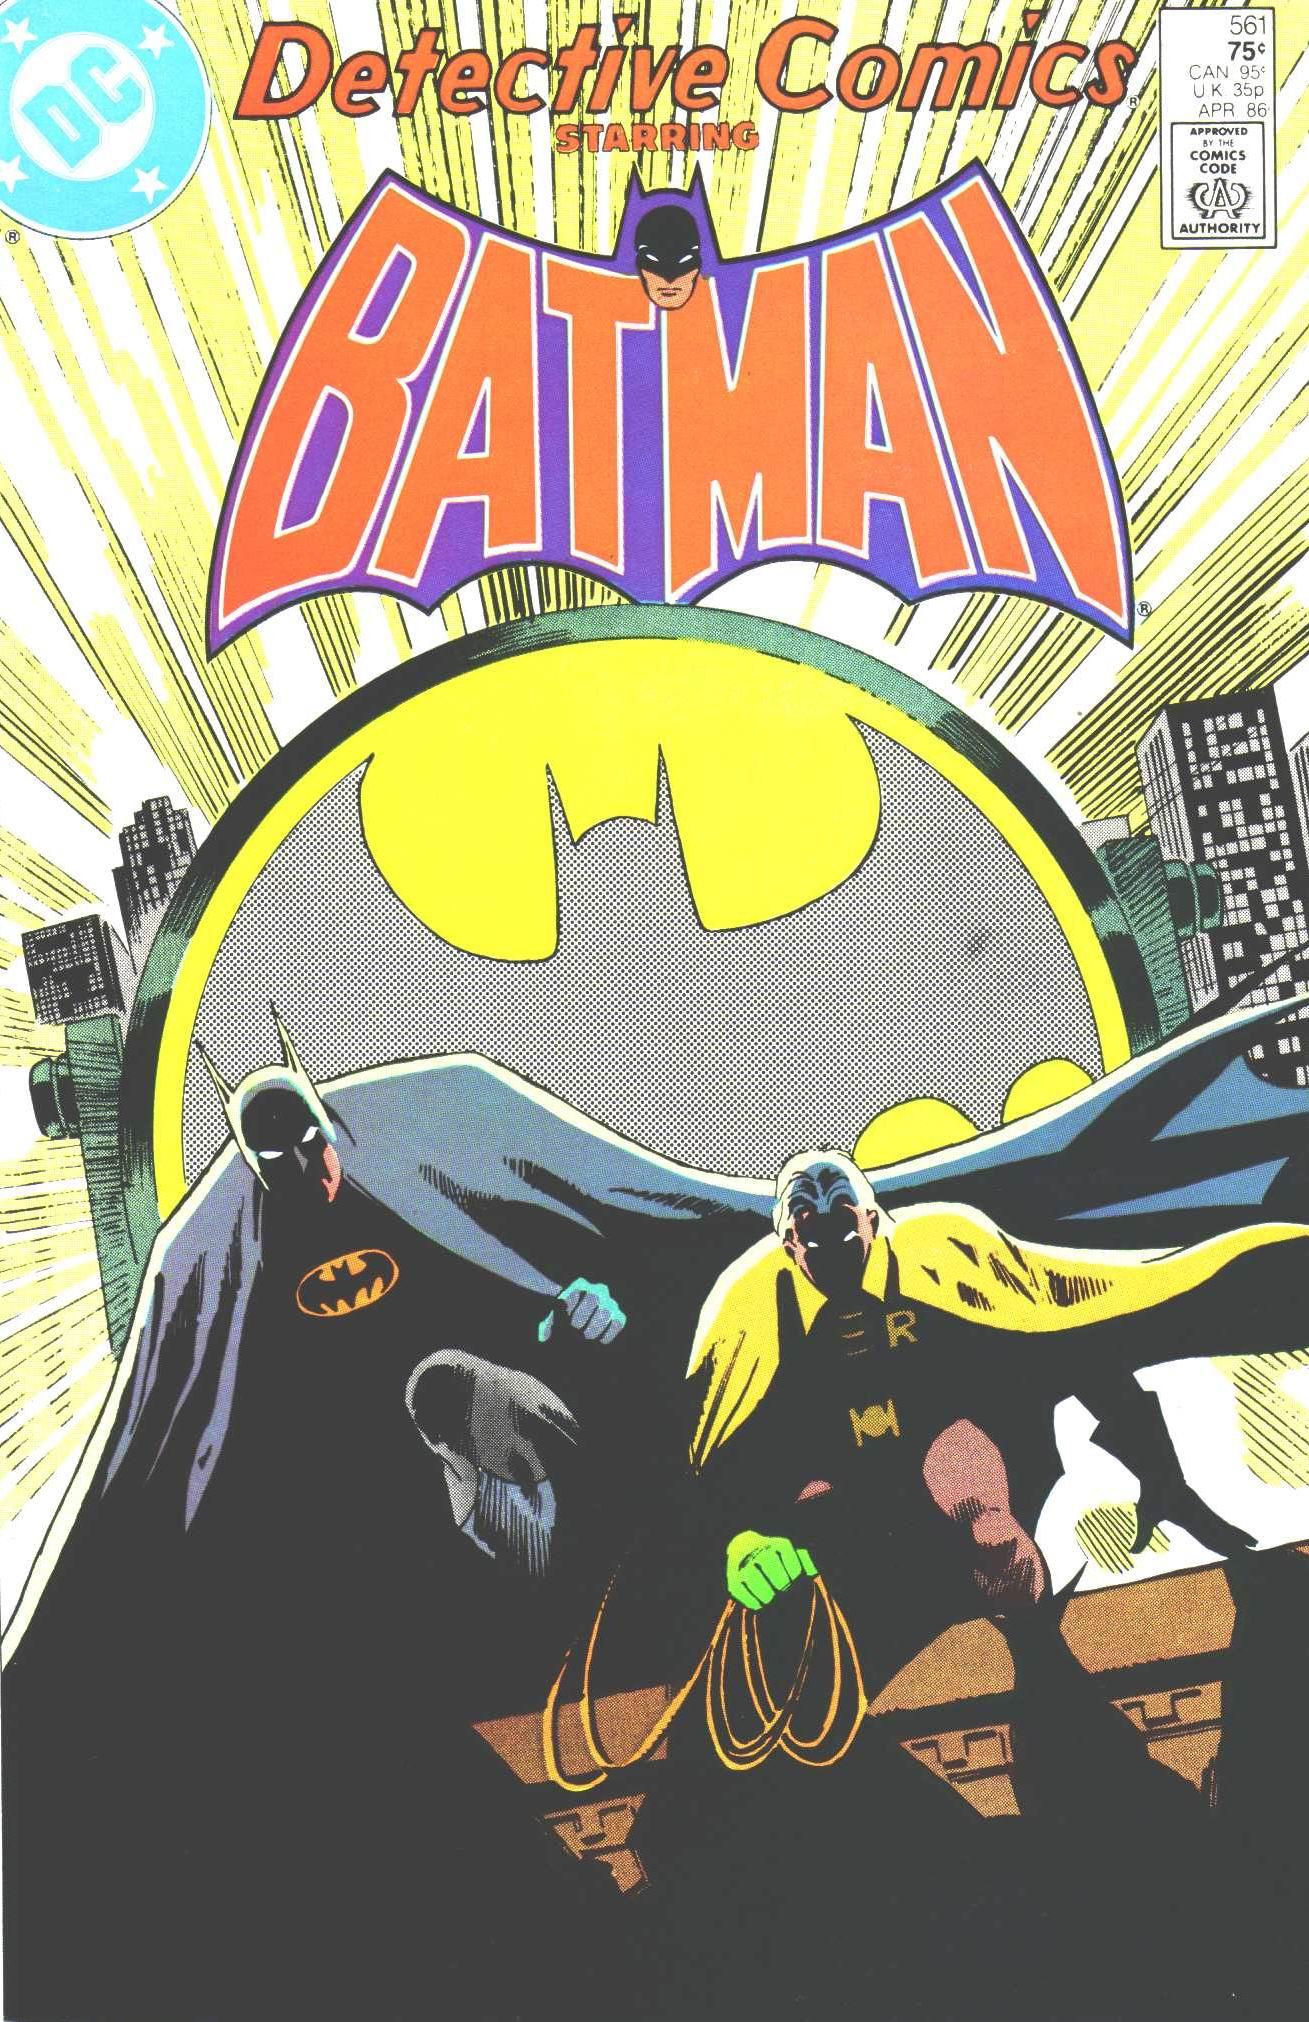 Detective Comics (1937) 561 Page 1